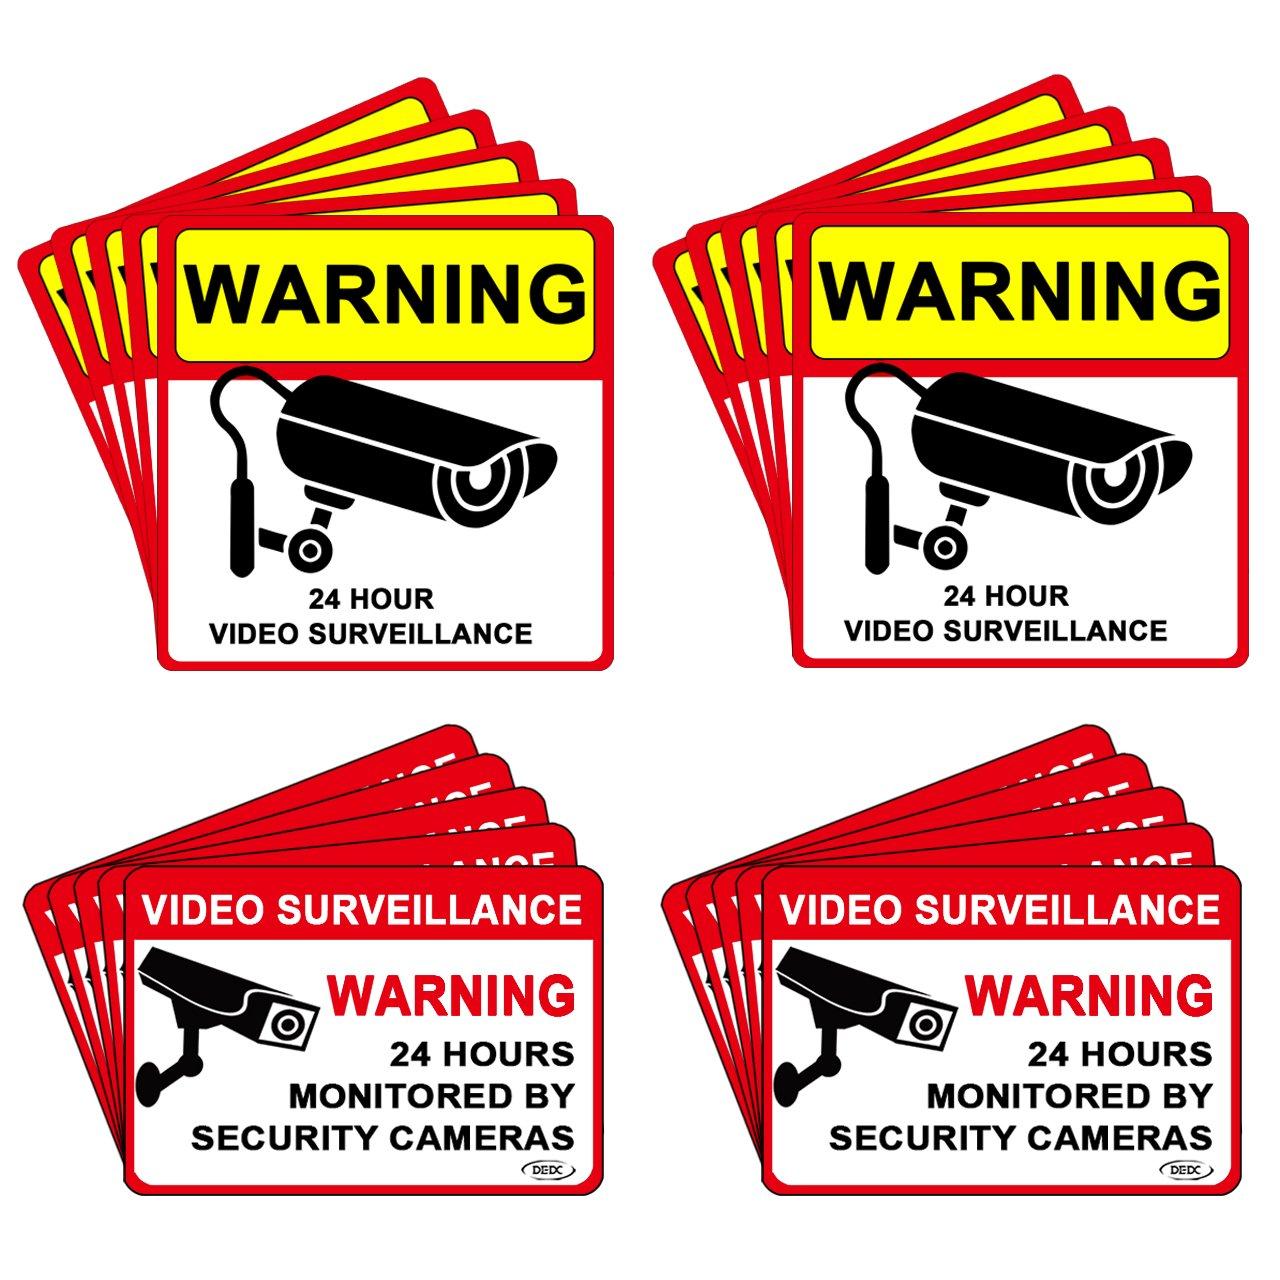 DEDC Pack de 20Pcs Cartel Zona Videovigilada Interior Exterior Placa Disuasorio PVC Expandido Pegatina Señ al Videovigilada Seguridad